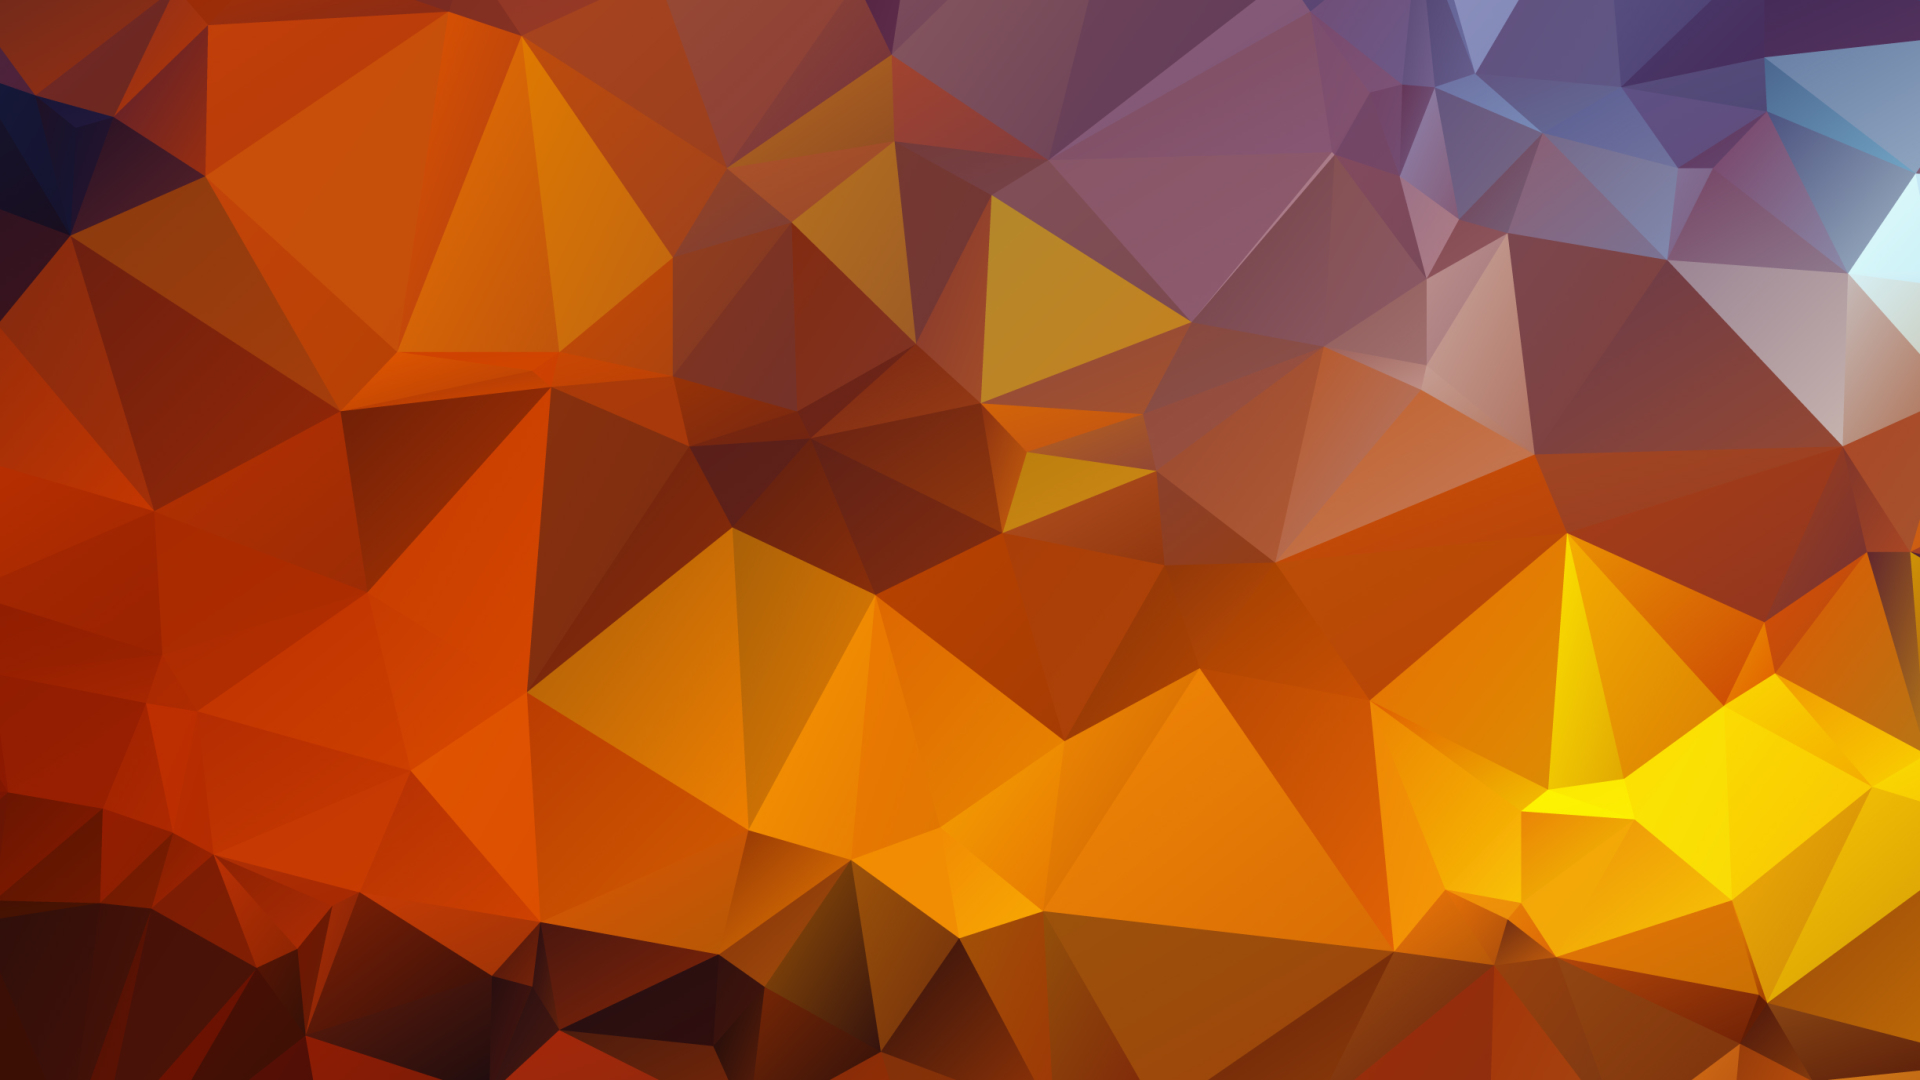 ios7-polygon12-lancork-1920×1080